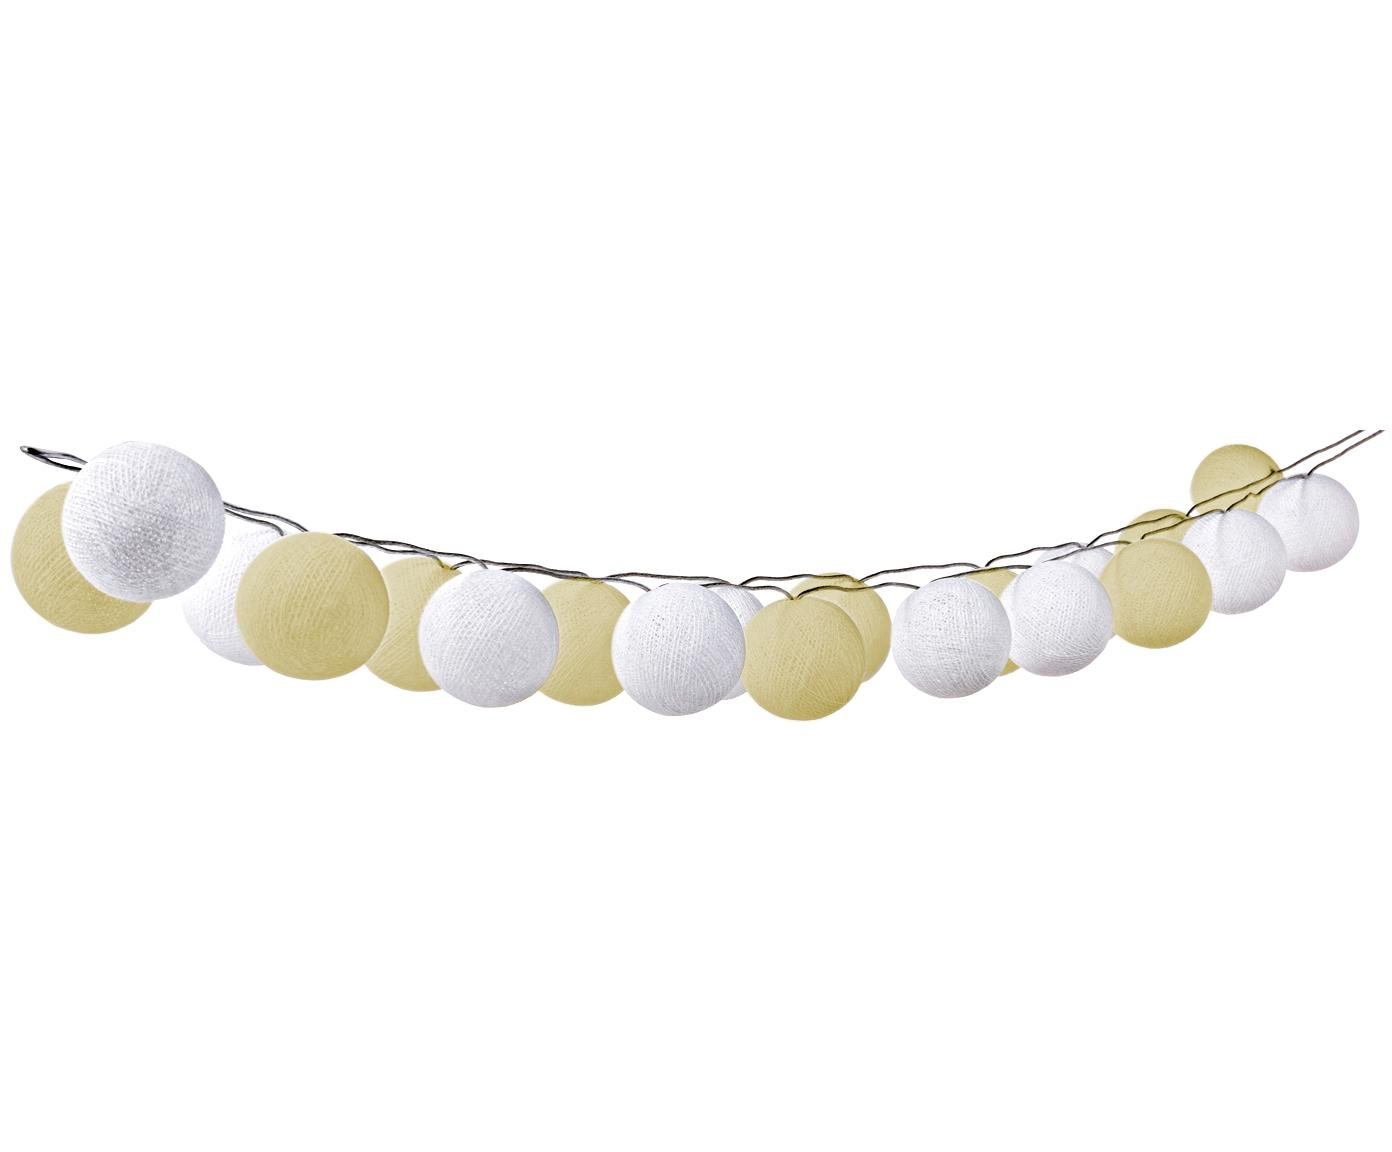 Ghirlanda  a LED Bellin, 320 cm, Lanterne: cotone, Crema, bianco, Lung. 320 cm